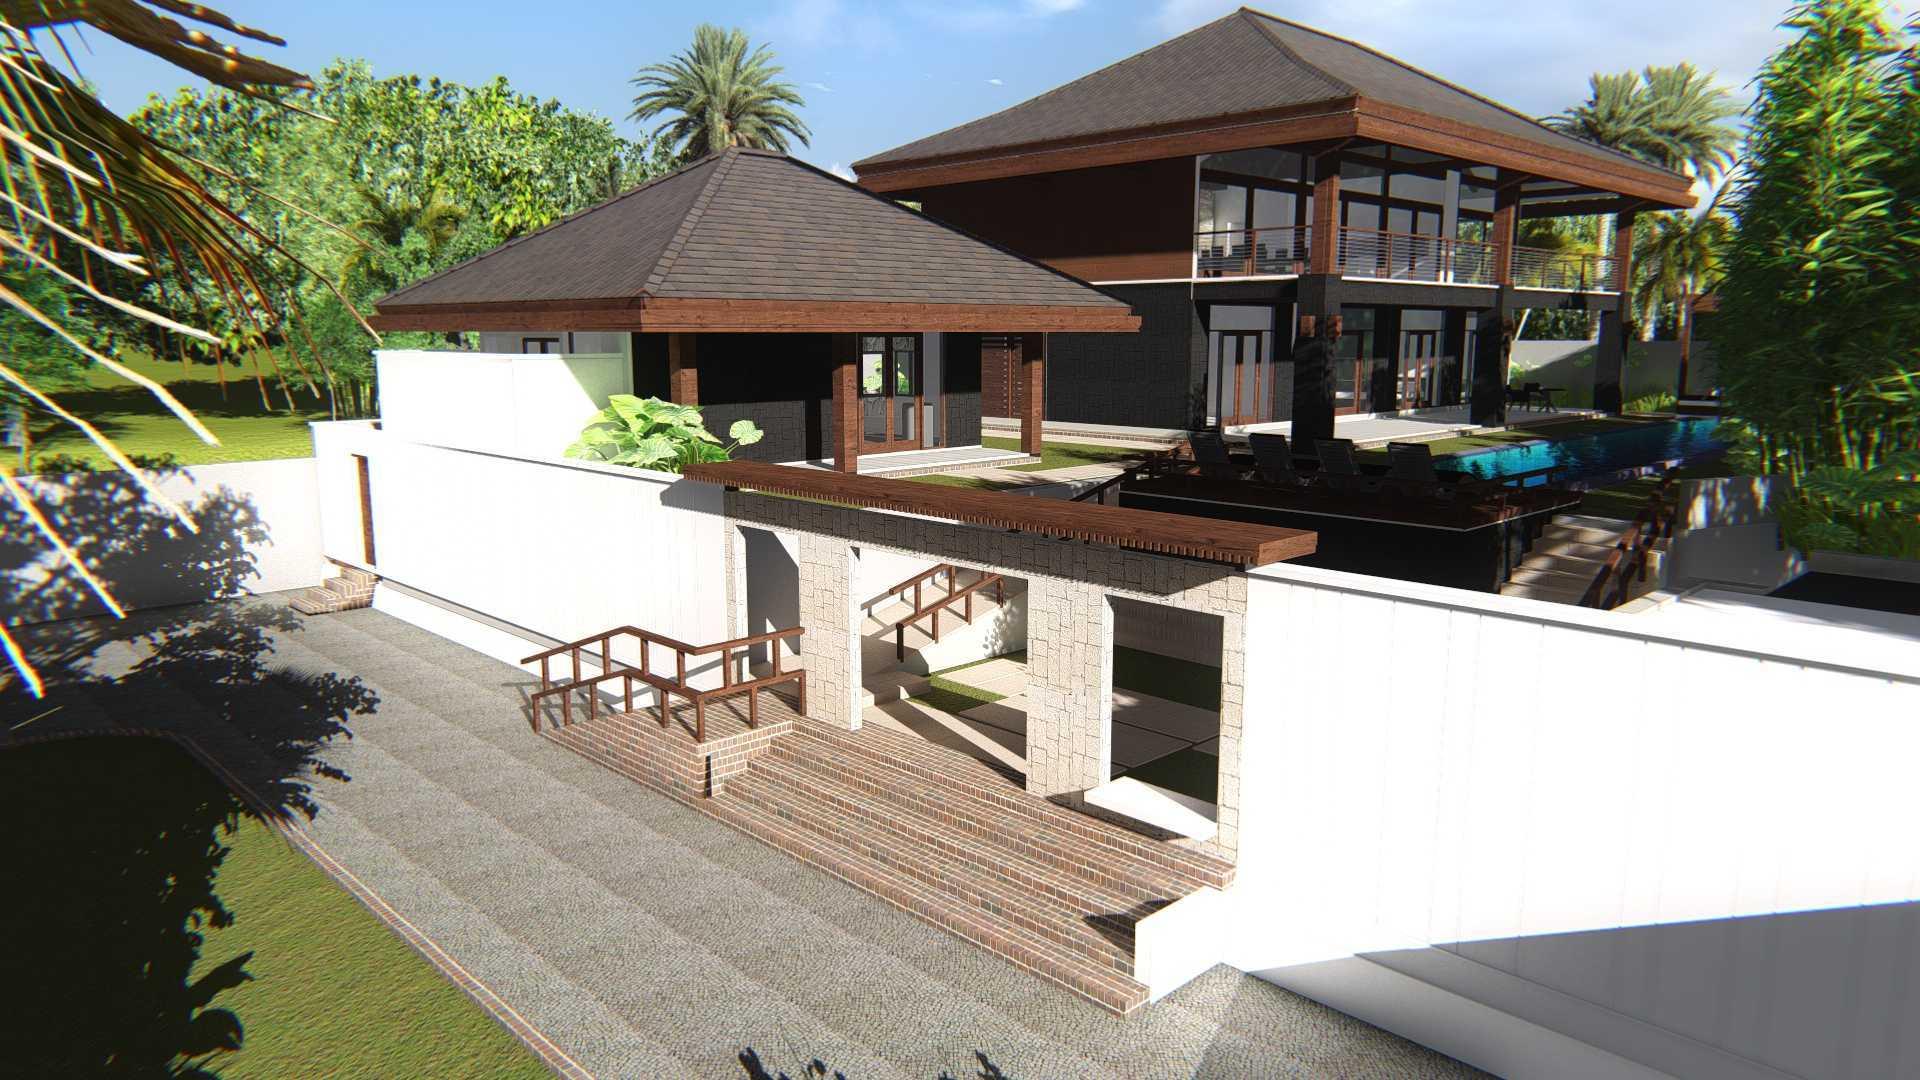 Archiola Villa Pecatu Pecatu, Kuta Sel., Kabupaten Badung, Bali, Indonesia Pecatu, Kuta Sel., Kabupaten Badung, Bali, Indonesia Villa Pecatu Asian <P>Front View</p> 41761